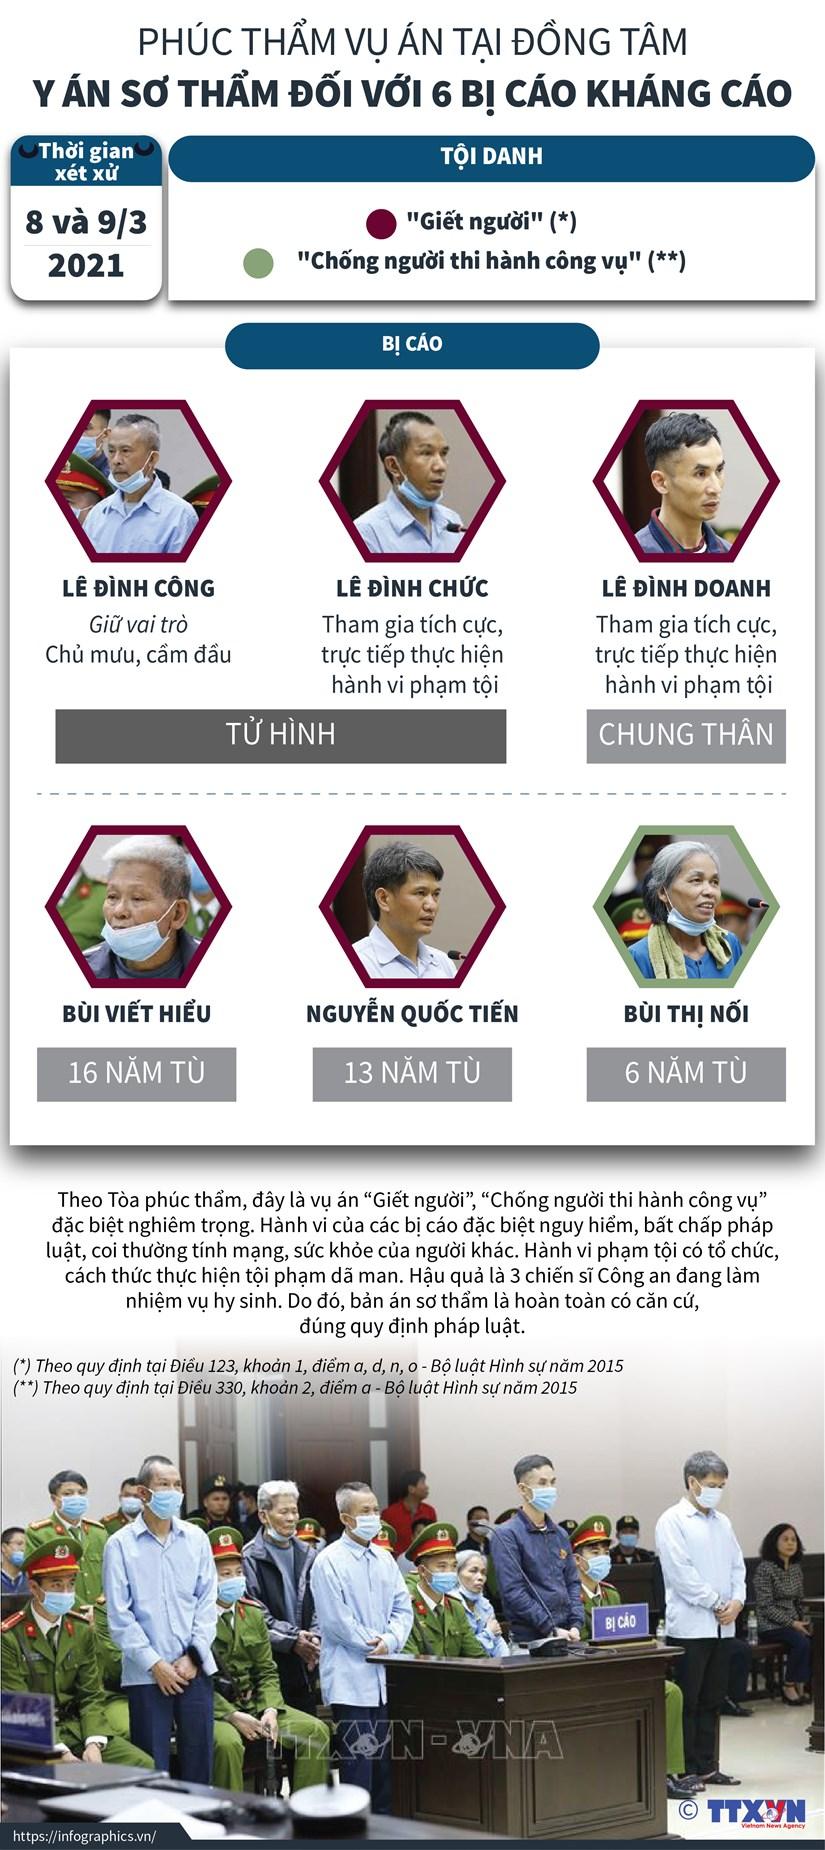 [Infographics] Vu an tai Dong Tam: Y an so tham doi voi 6 bi cao hinh anh 1